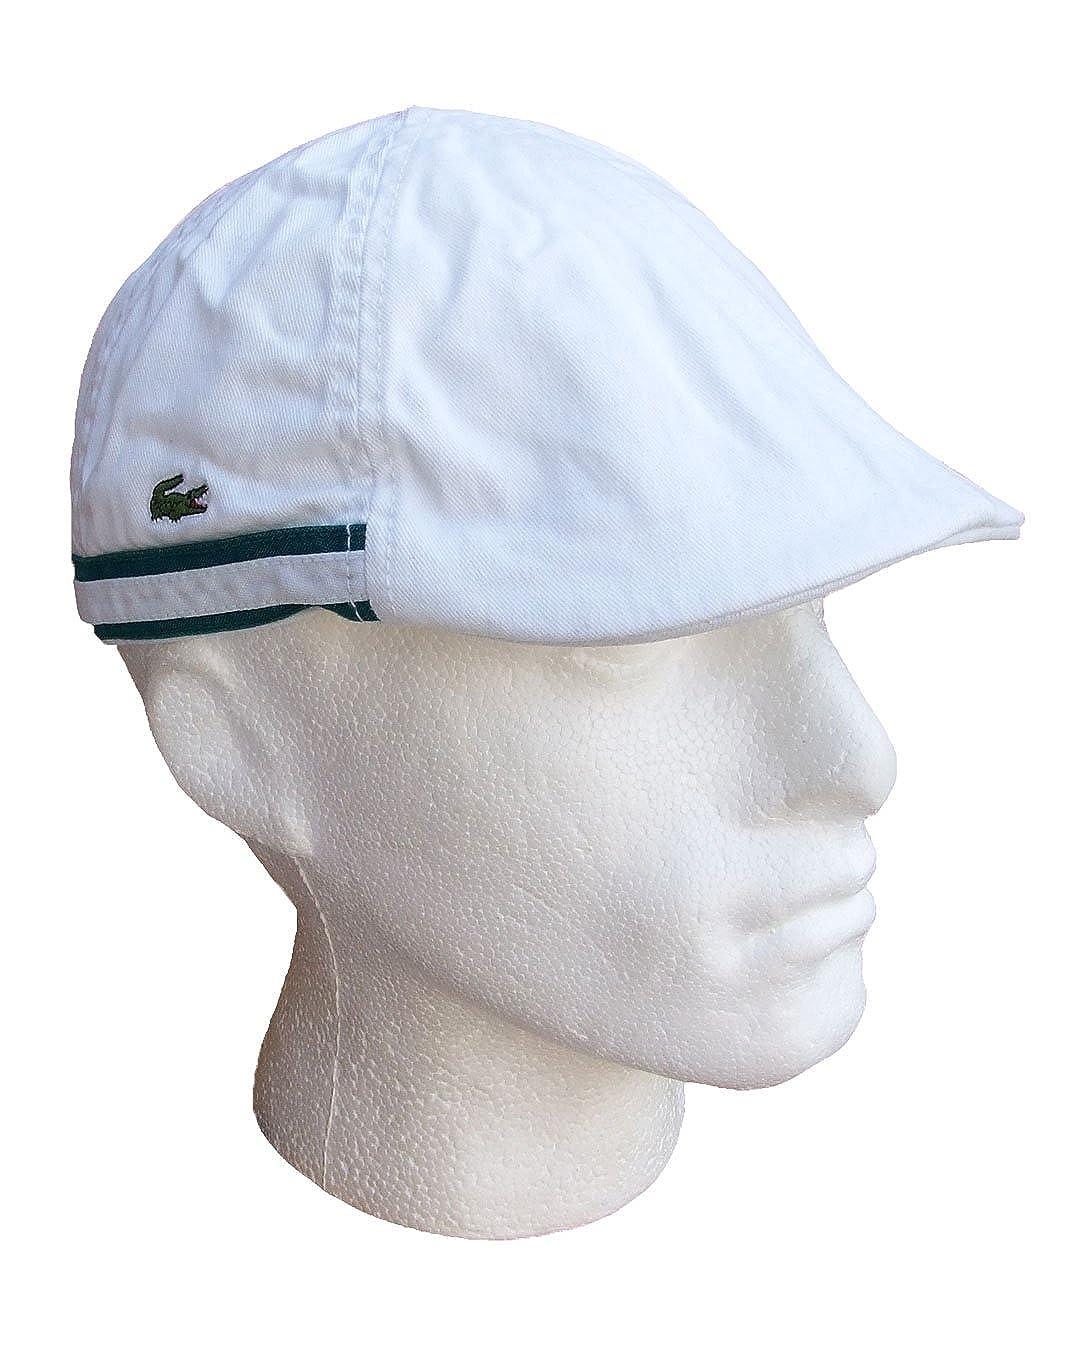 e3041a664 Lacoste Golf Flat Cap Cotton White RK1904 Mens (Large): Amazon.co.uk ...